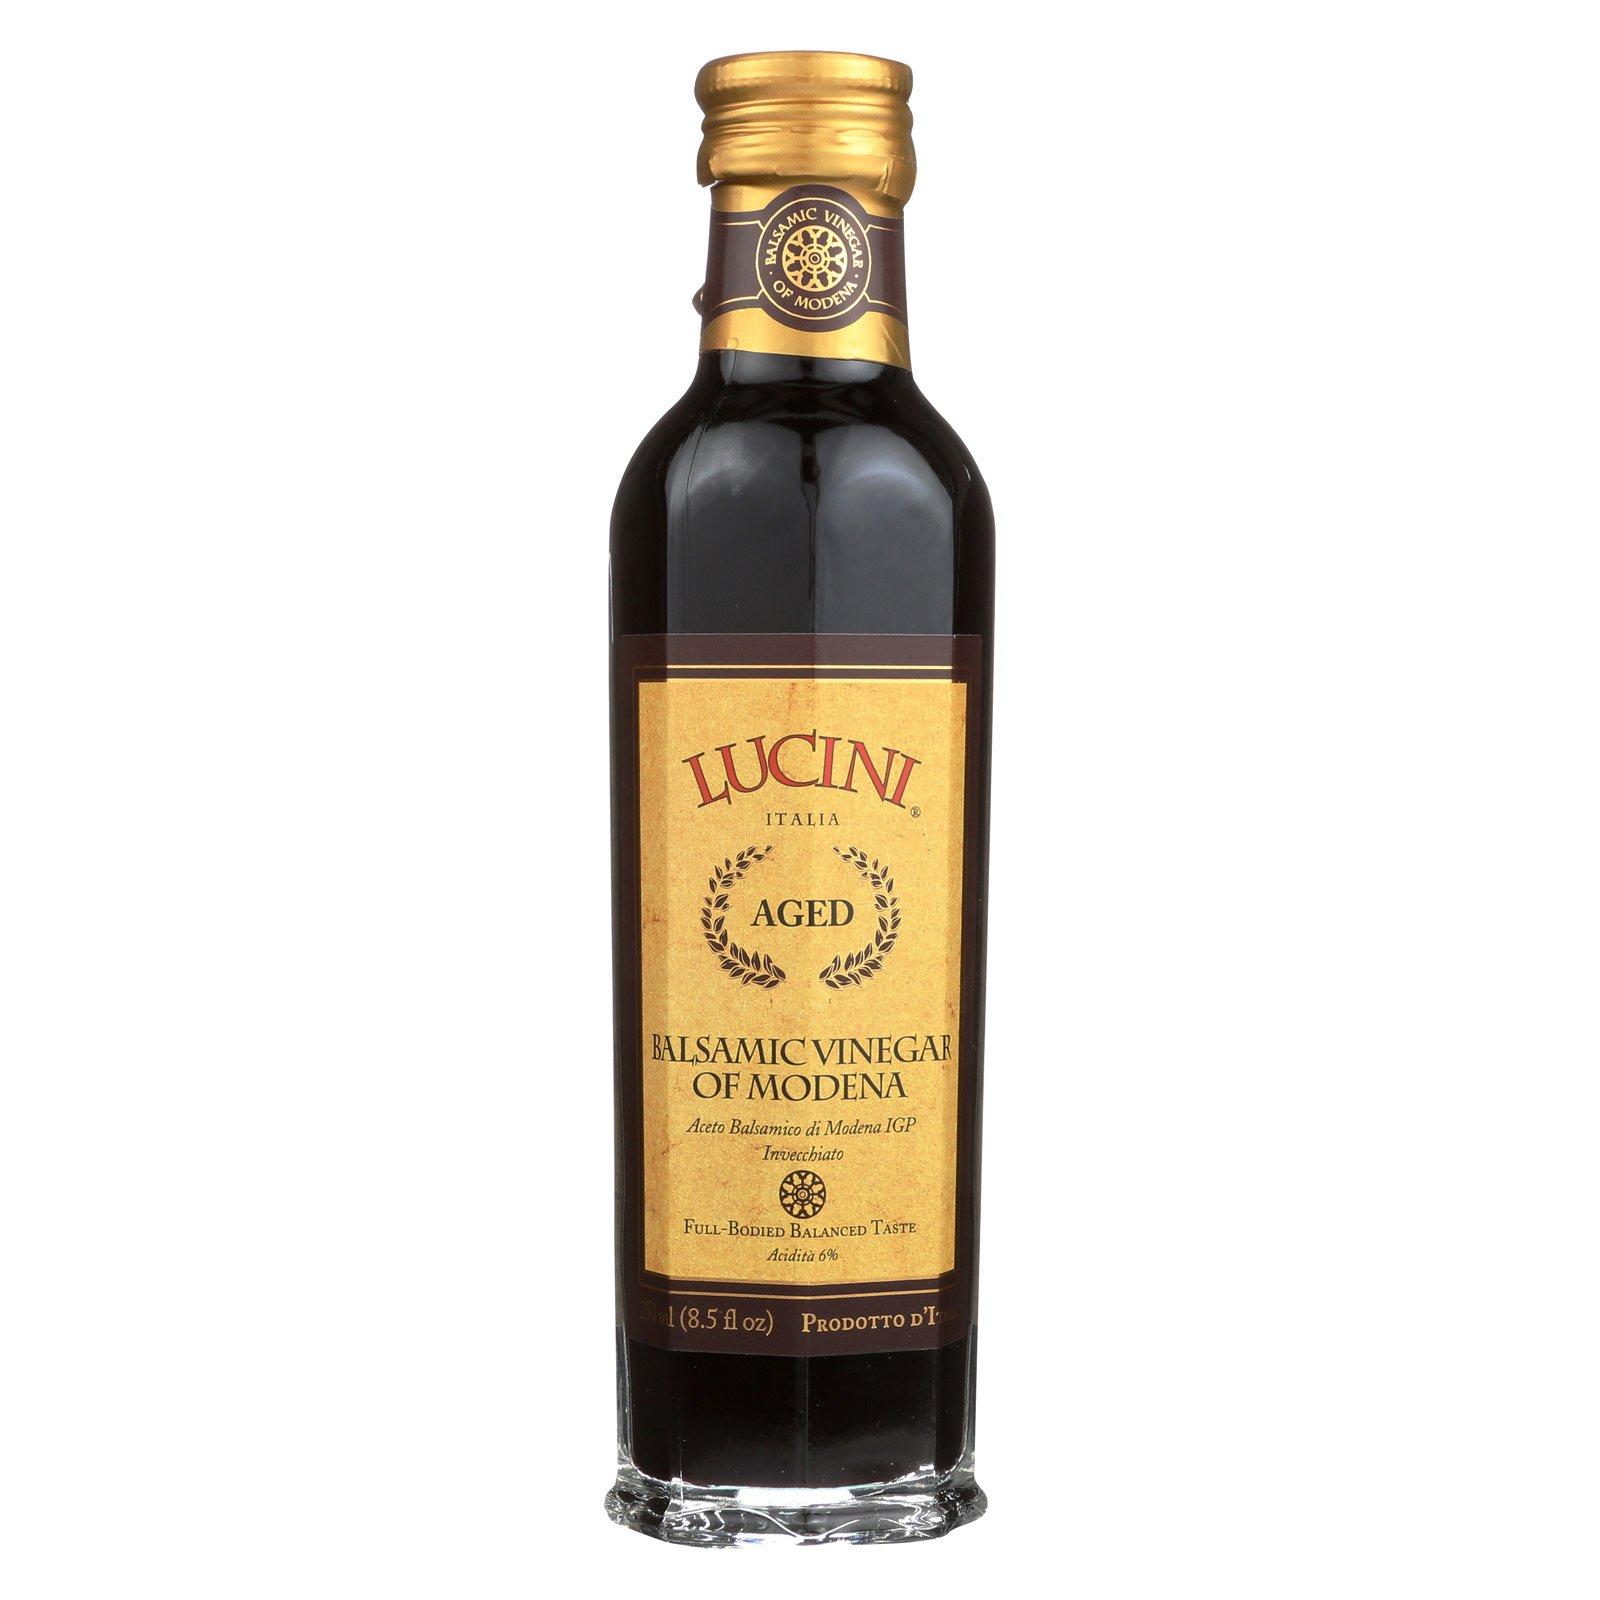 Lucini Italia Gran Riserva Balsamic Vinegar of Modena - Case of 6 - 8.5 Fl oz.